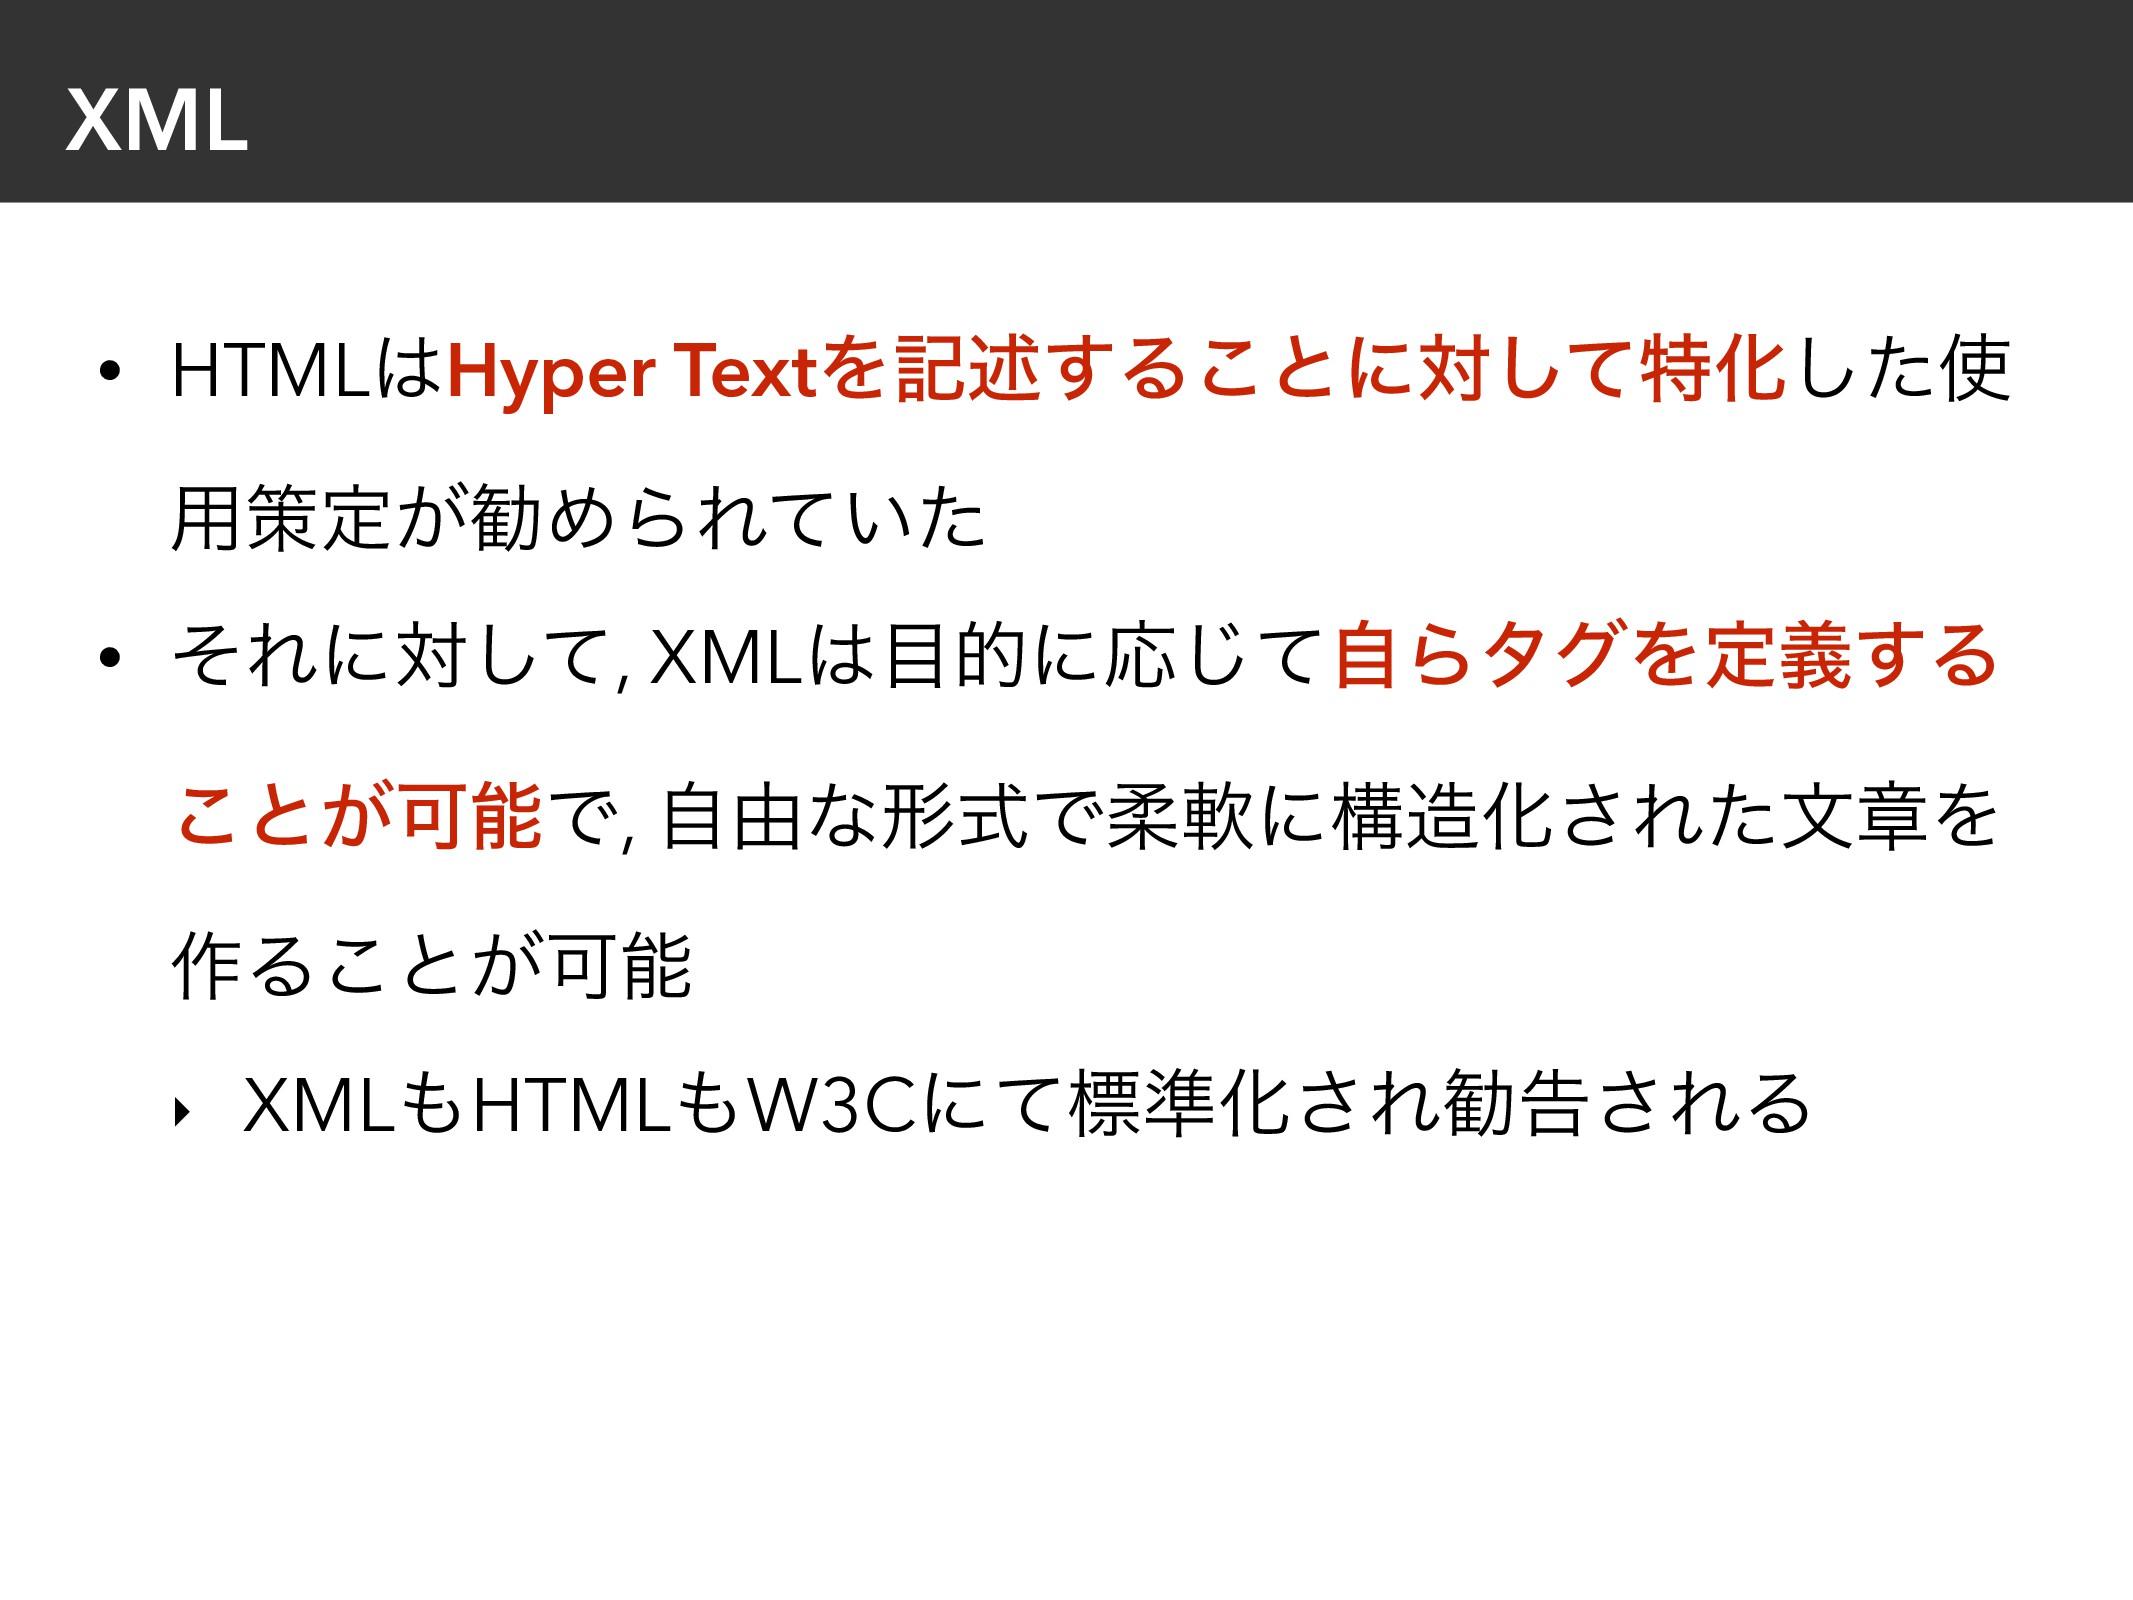 XML • HTMLHyper TextΛهड़͢Δ͜ͱʹରͯ͠ಛԽͨ͠ ༻ࡦఆ͕קΊΒΕͯ...